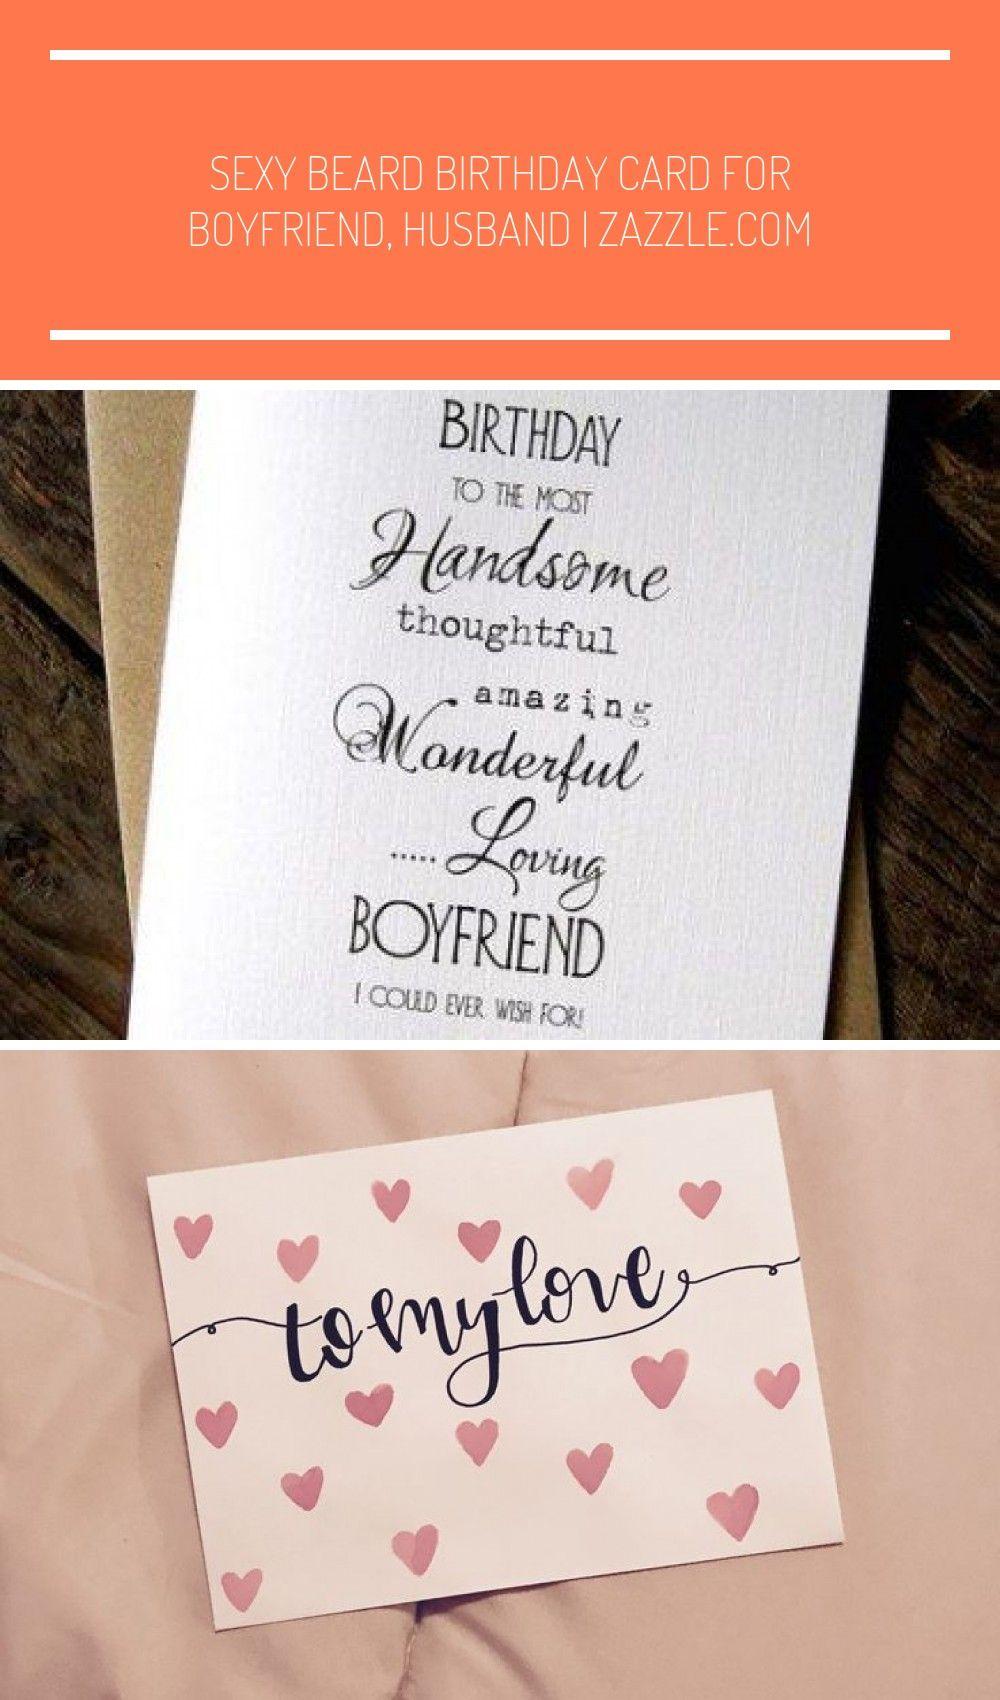 New Birthday Card Design For Boyfriend Ideas Birthday Design Birthday Card For Boyfriend New Birthday Card Design For Boyfriend Ideas Birthday Card Design Birthday Cards For Boyfriend Birthday Cards